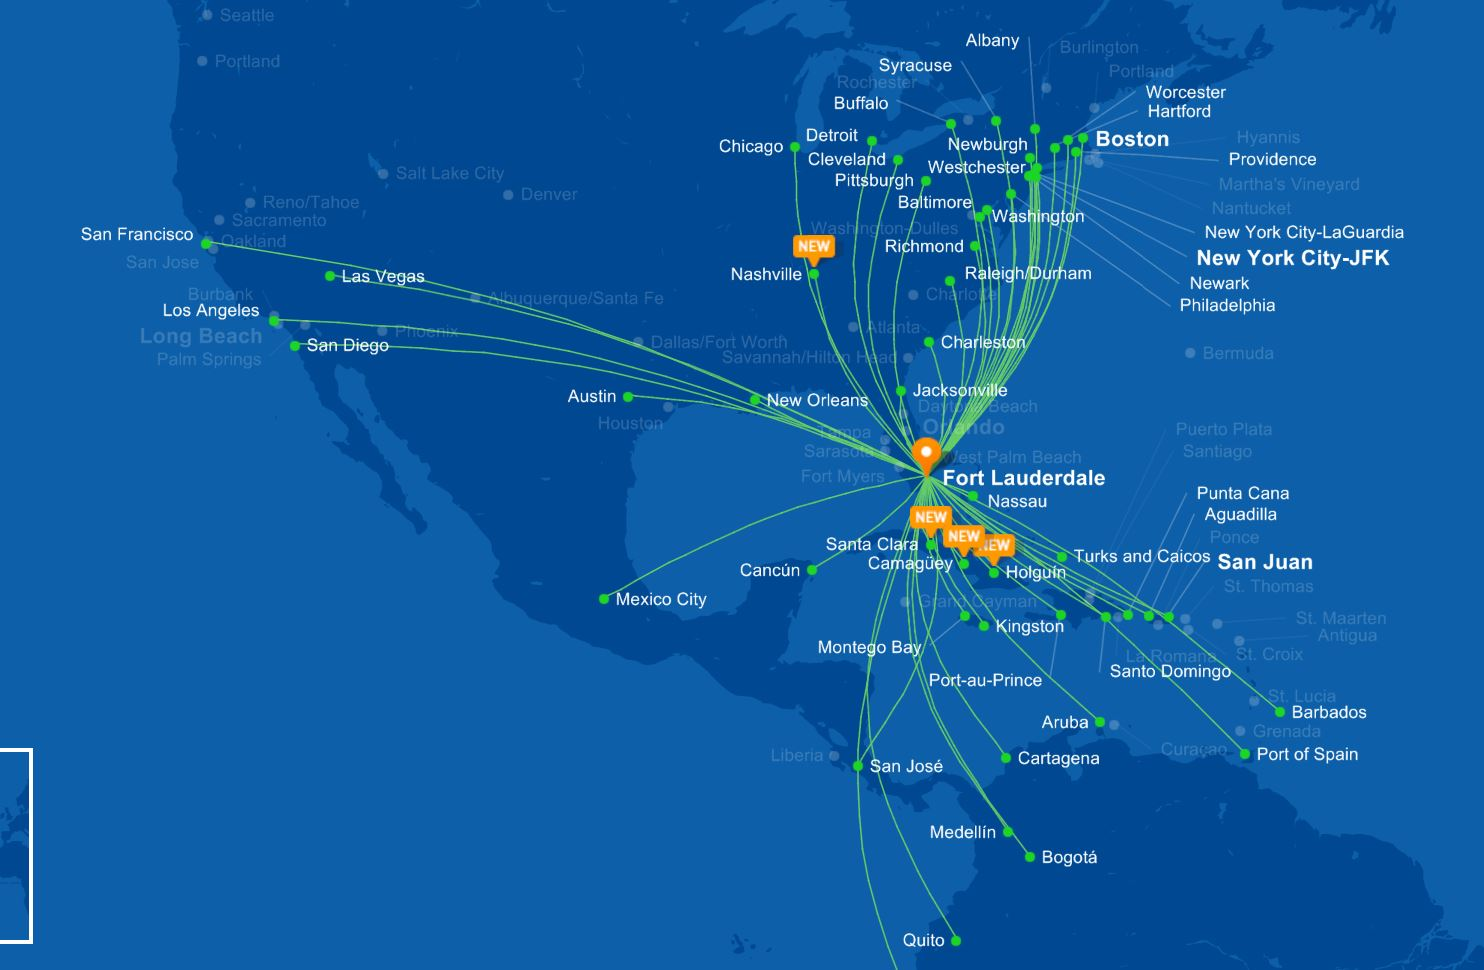 Jet Blue's Current Fort Lauderdale Routes